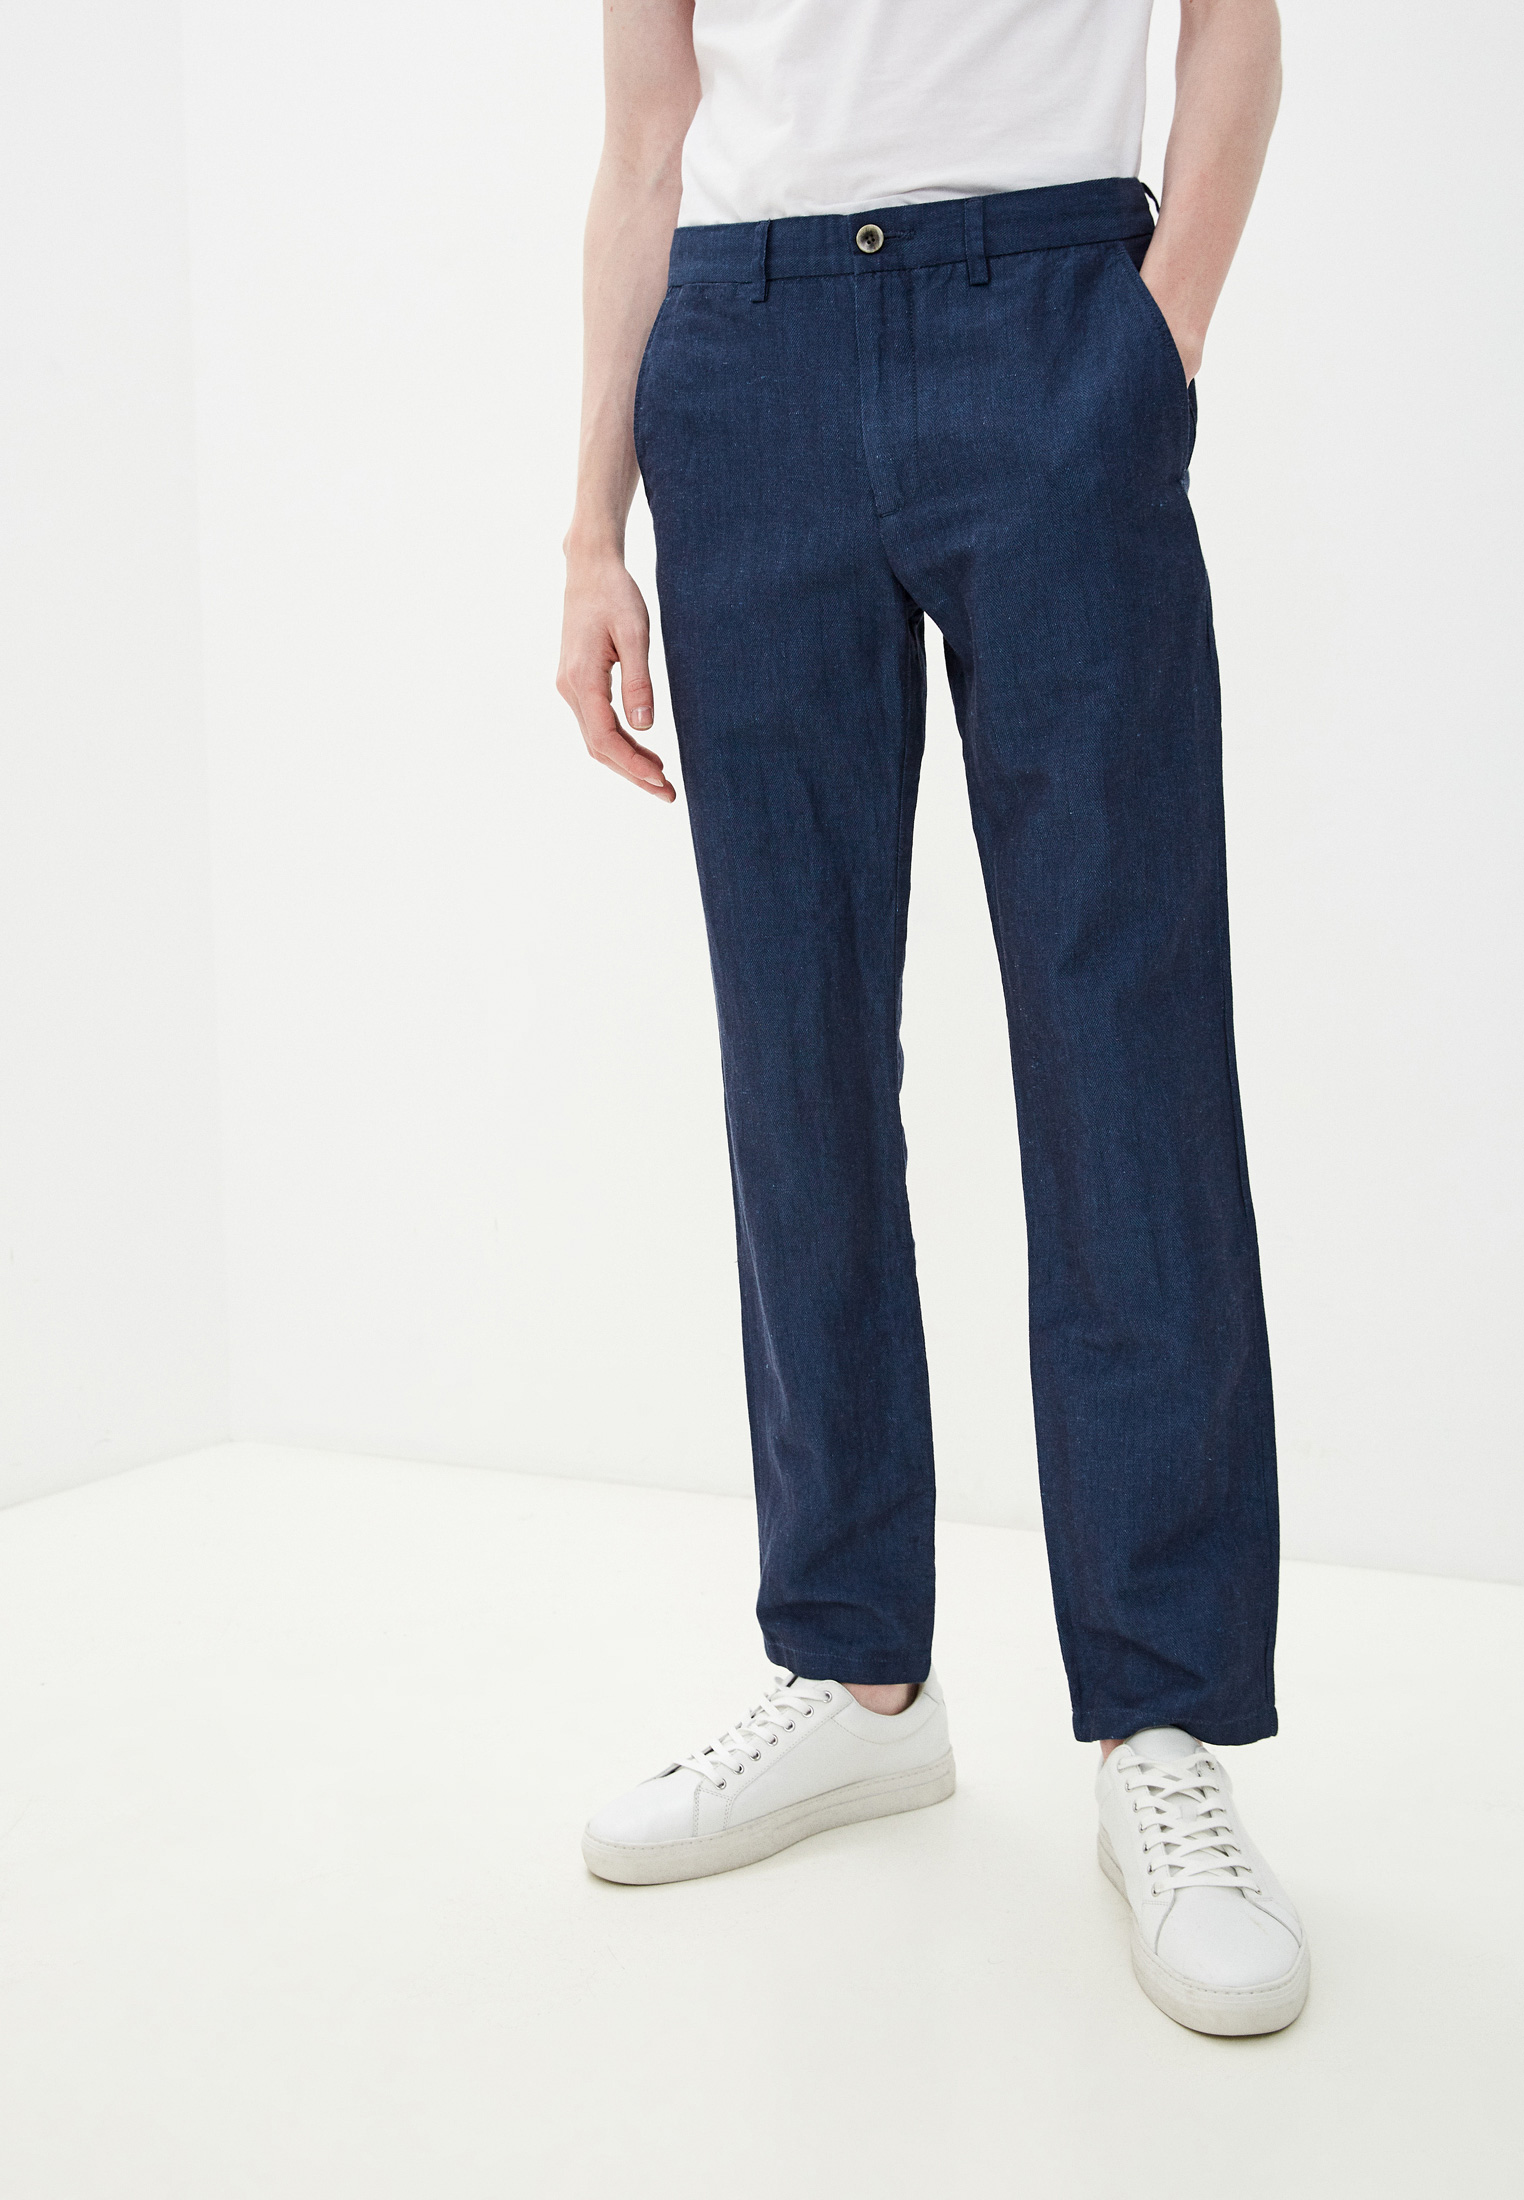 Мужские прямые брюки Tommy Hilfiger (Томми Хилфигер) Брюки Tommy Hilfiger